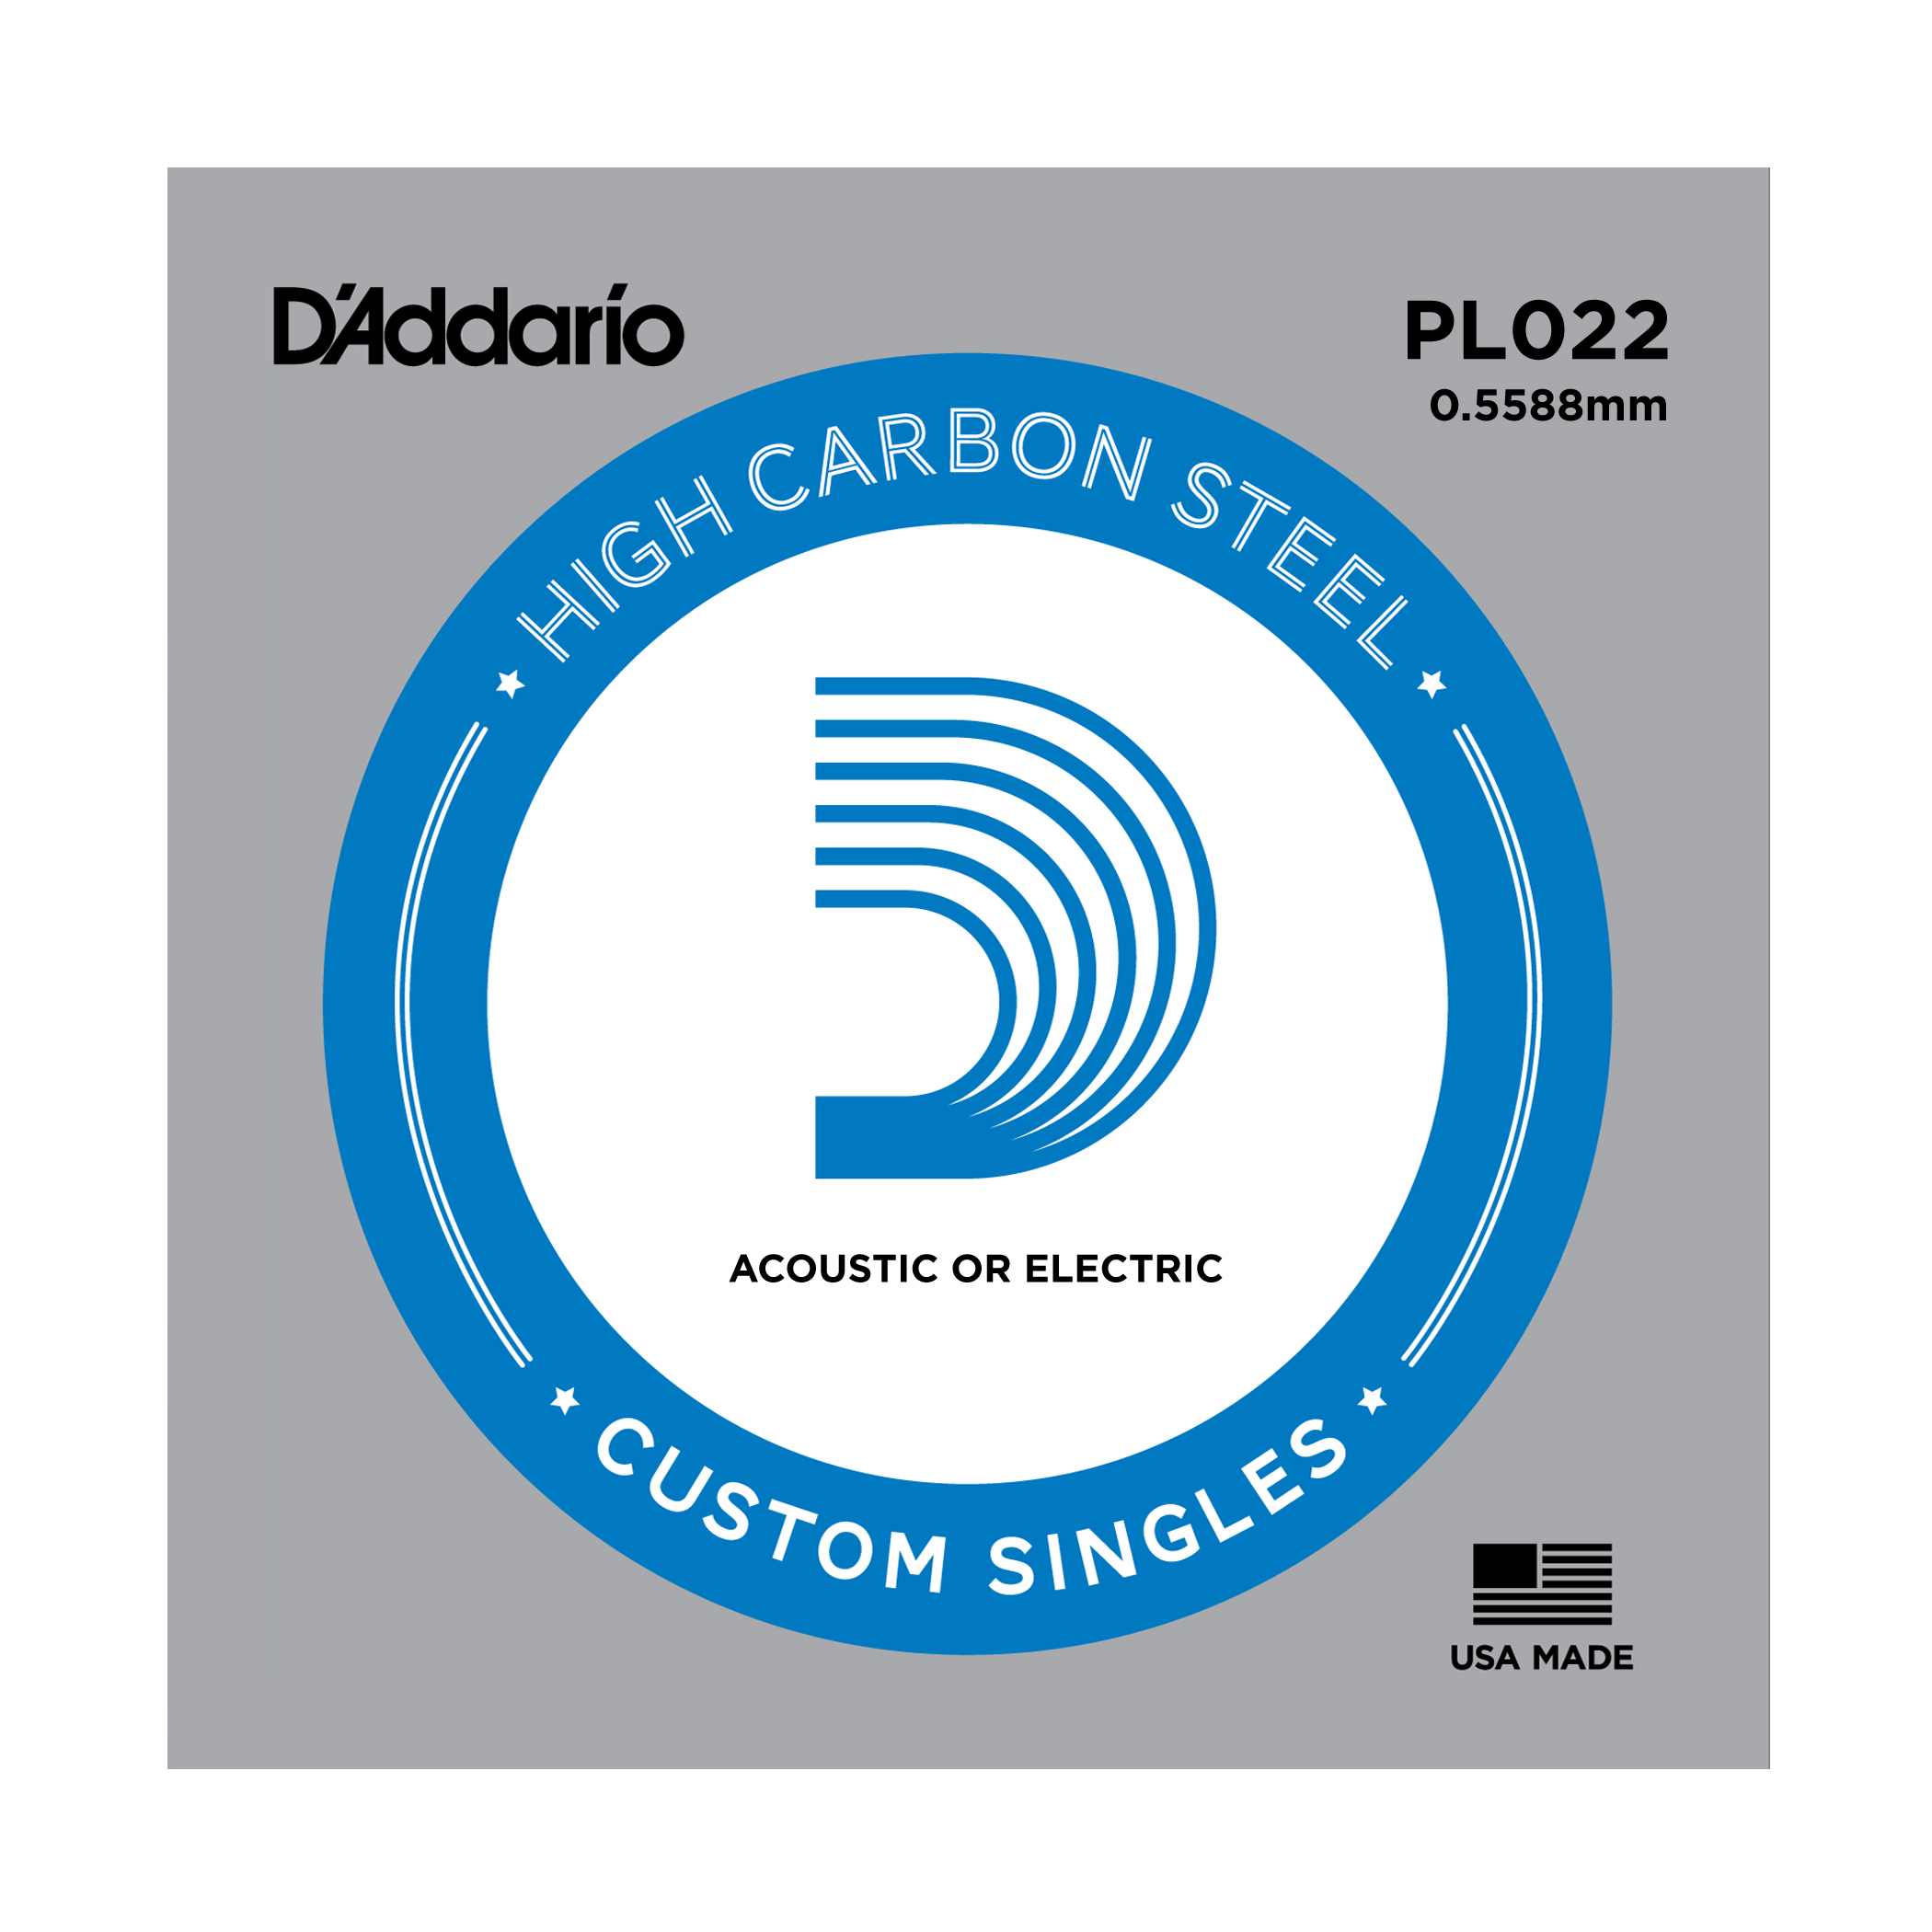 D'addario plain singles